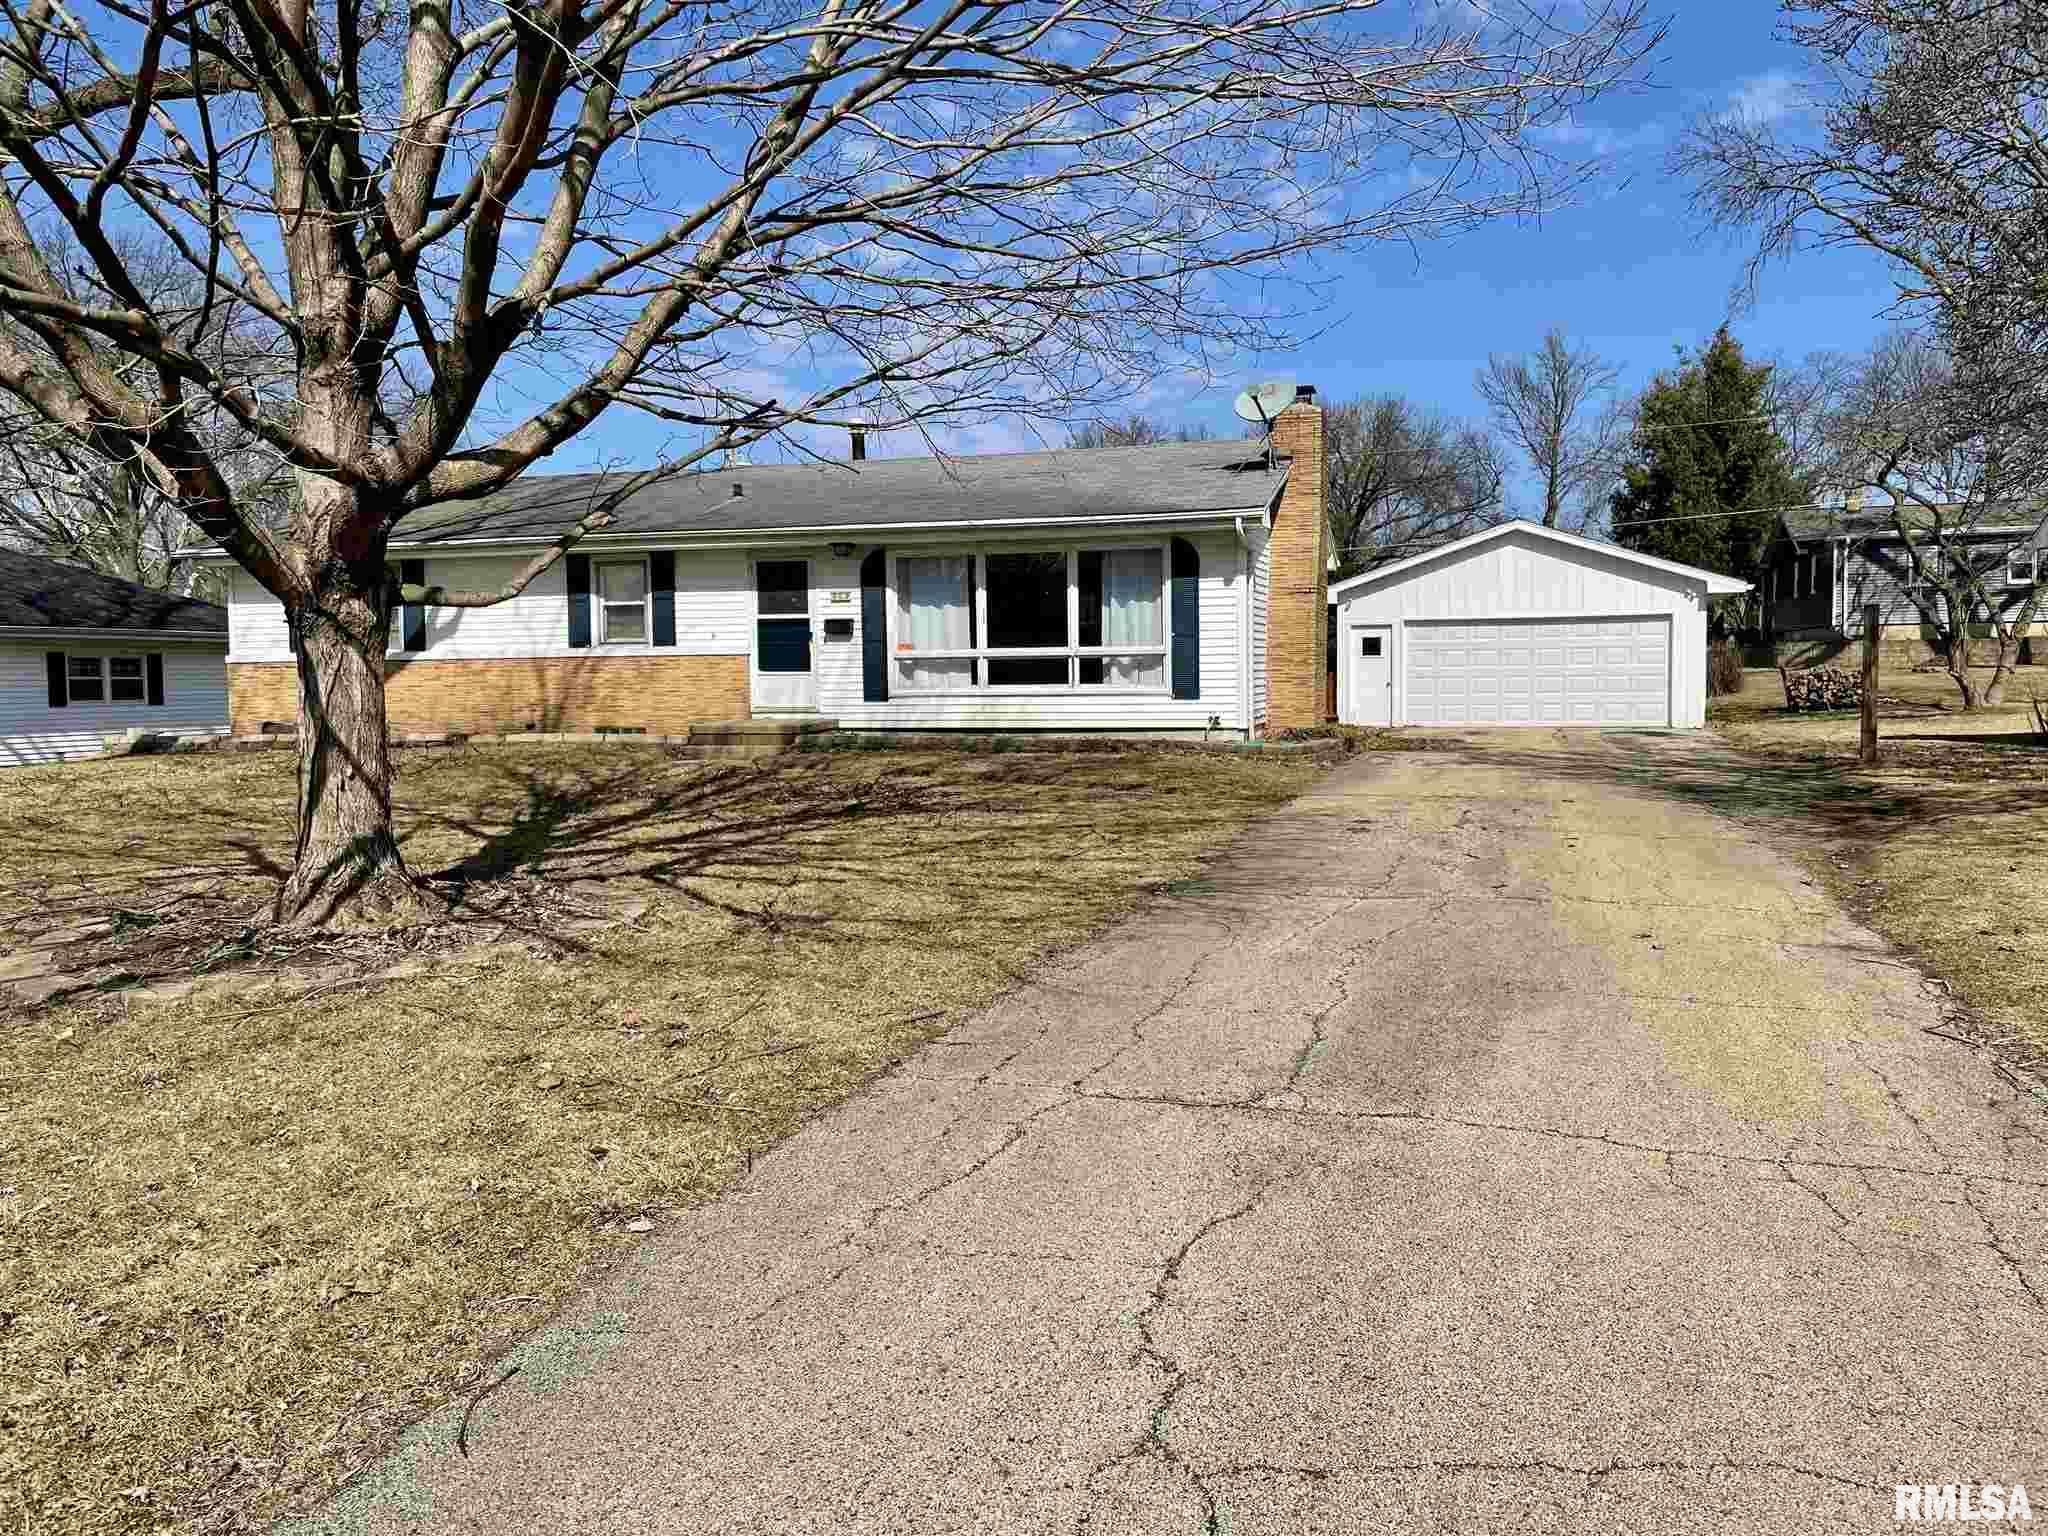 509 W BURTON Property Photo - Eureka, IL real estate listing